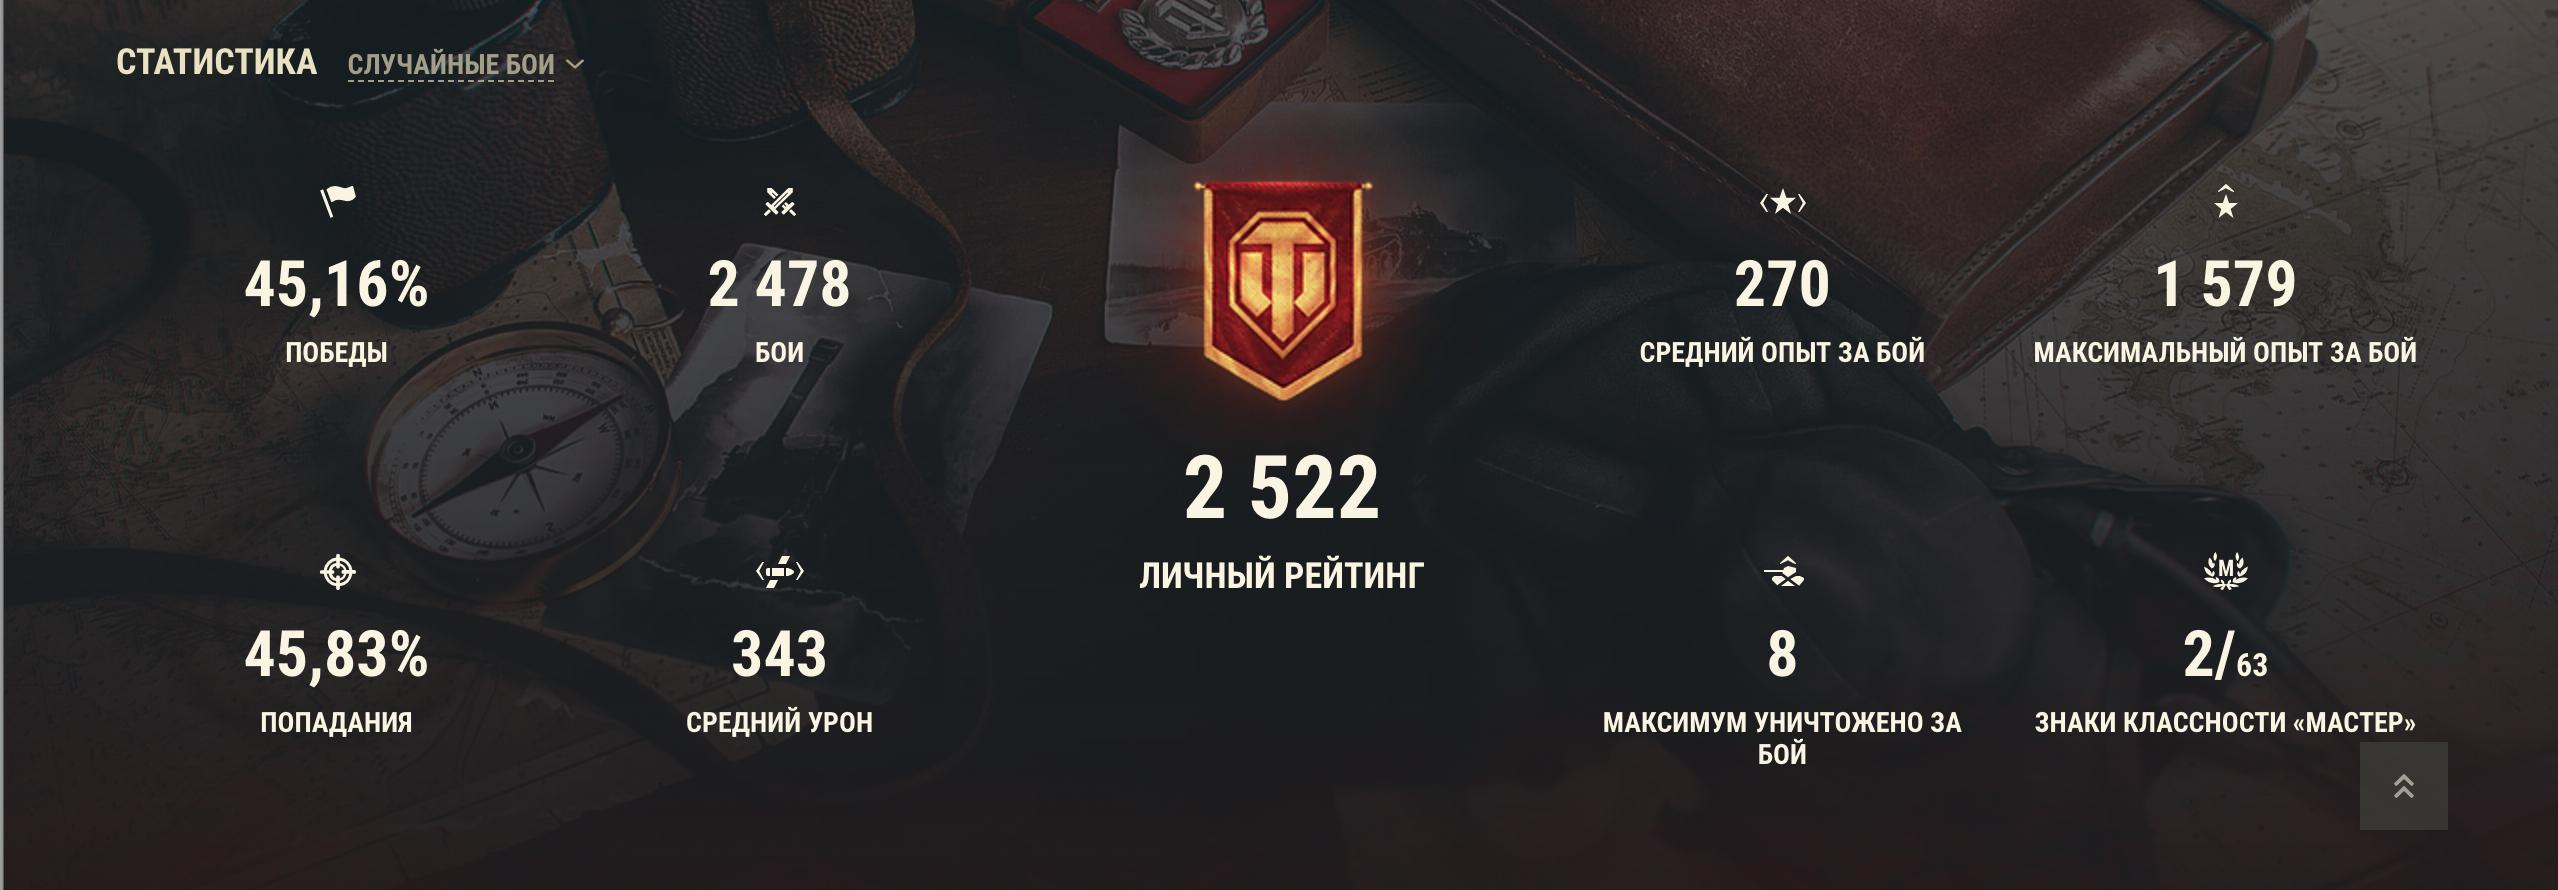 WOT Аккаунт - 2 ПРЕМА, 2К БОЕВ